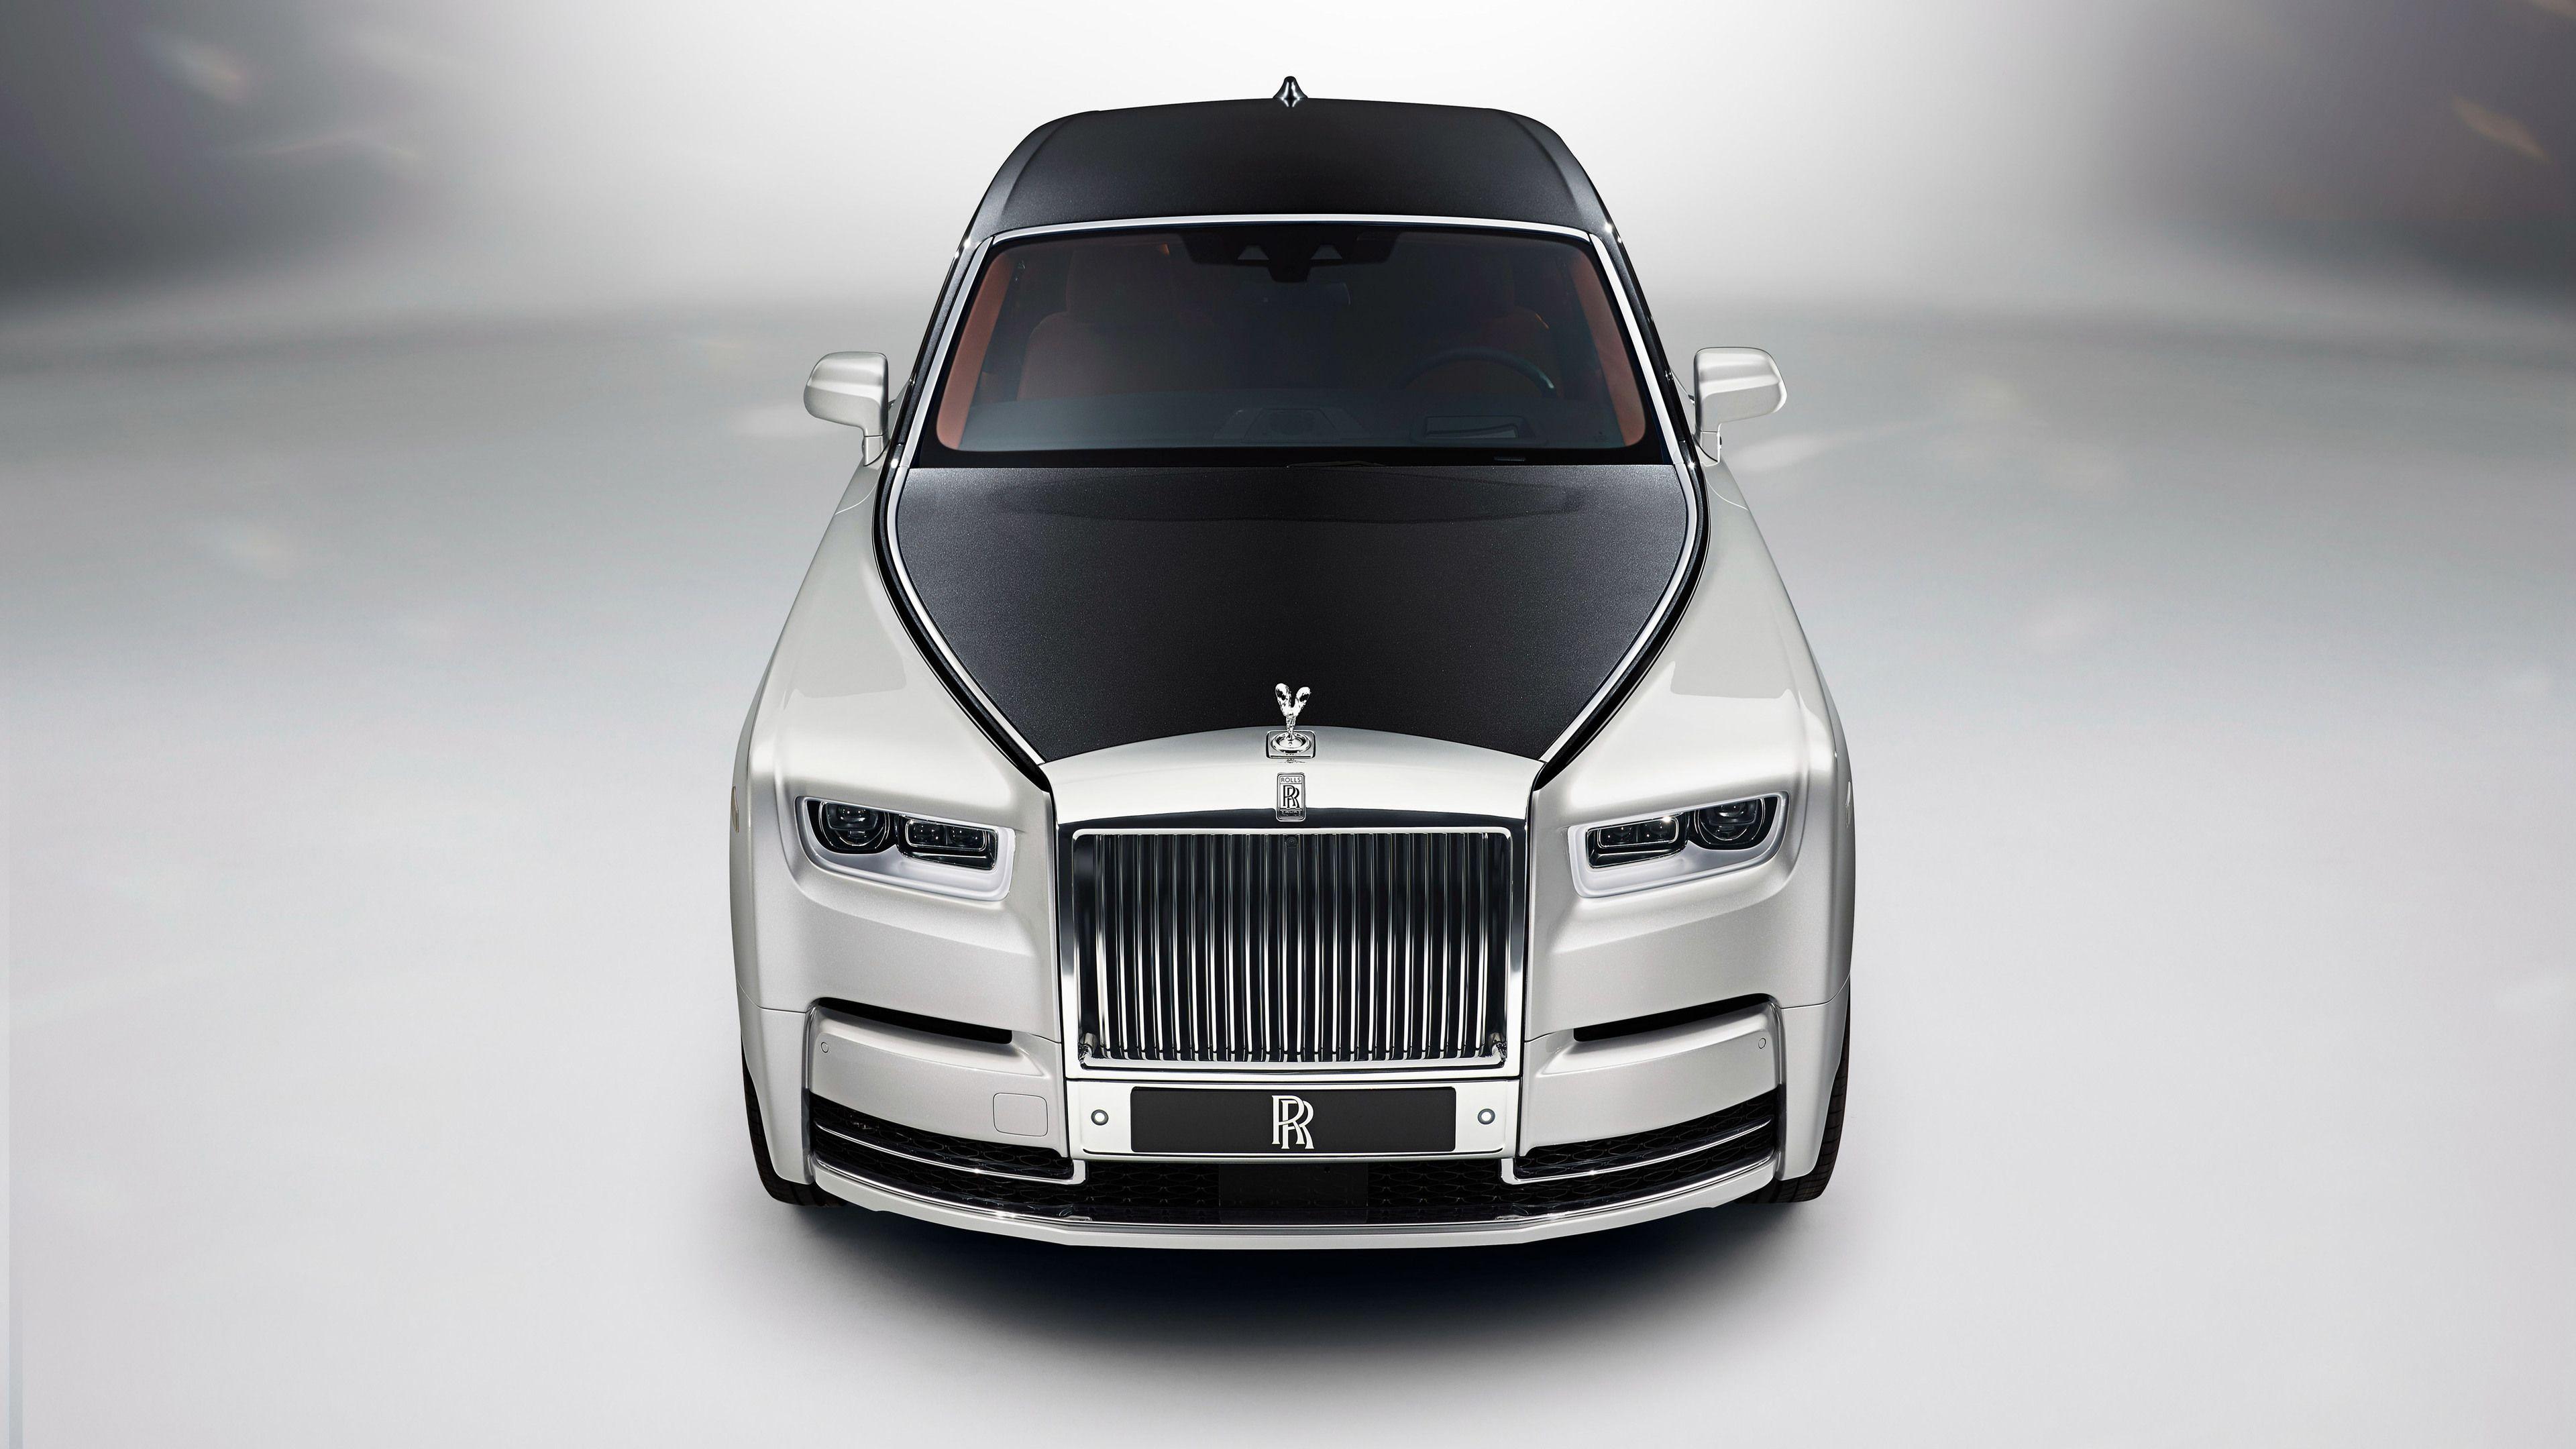 2017 Rolls Royce Phantom rolls royce wallpapers, rolls royce phantom wallpapers,…